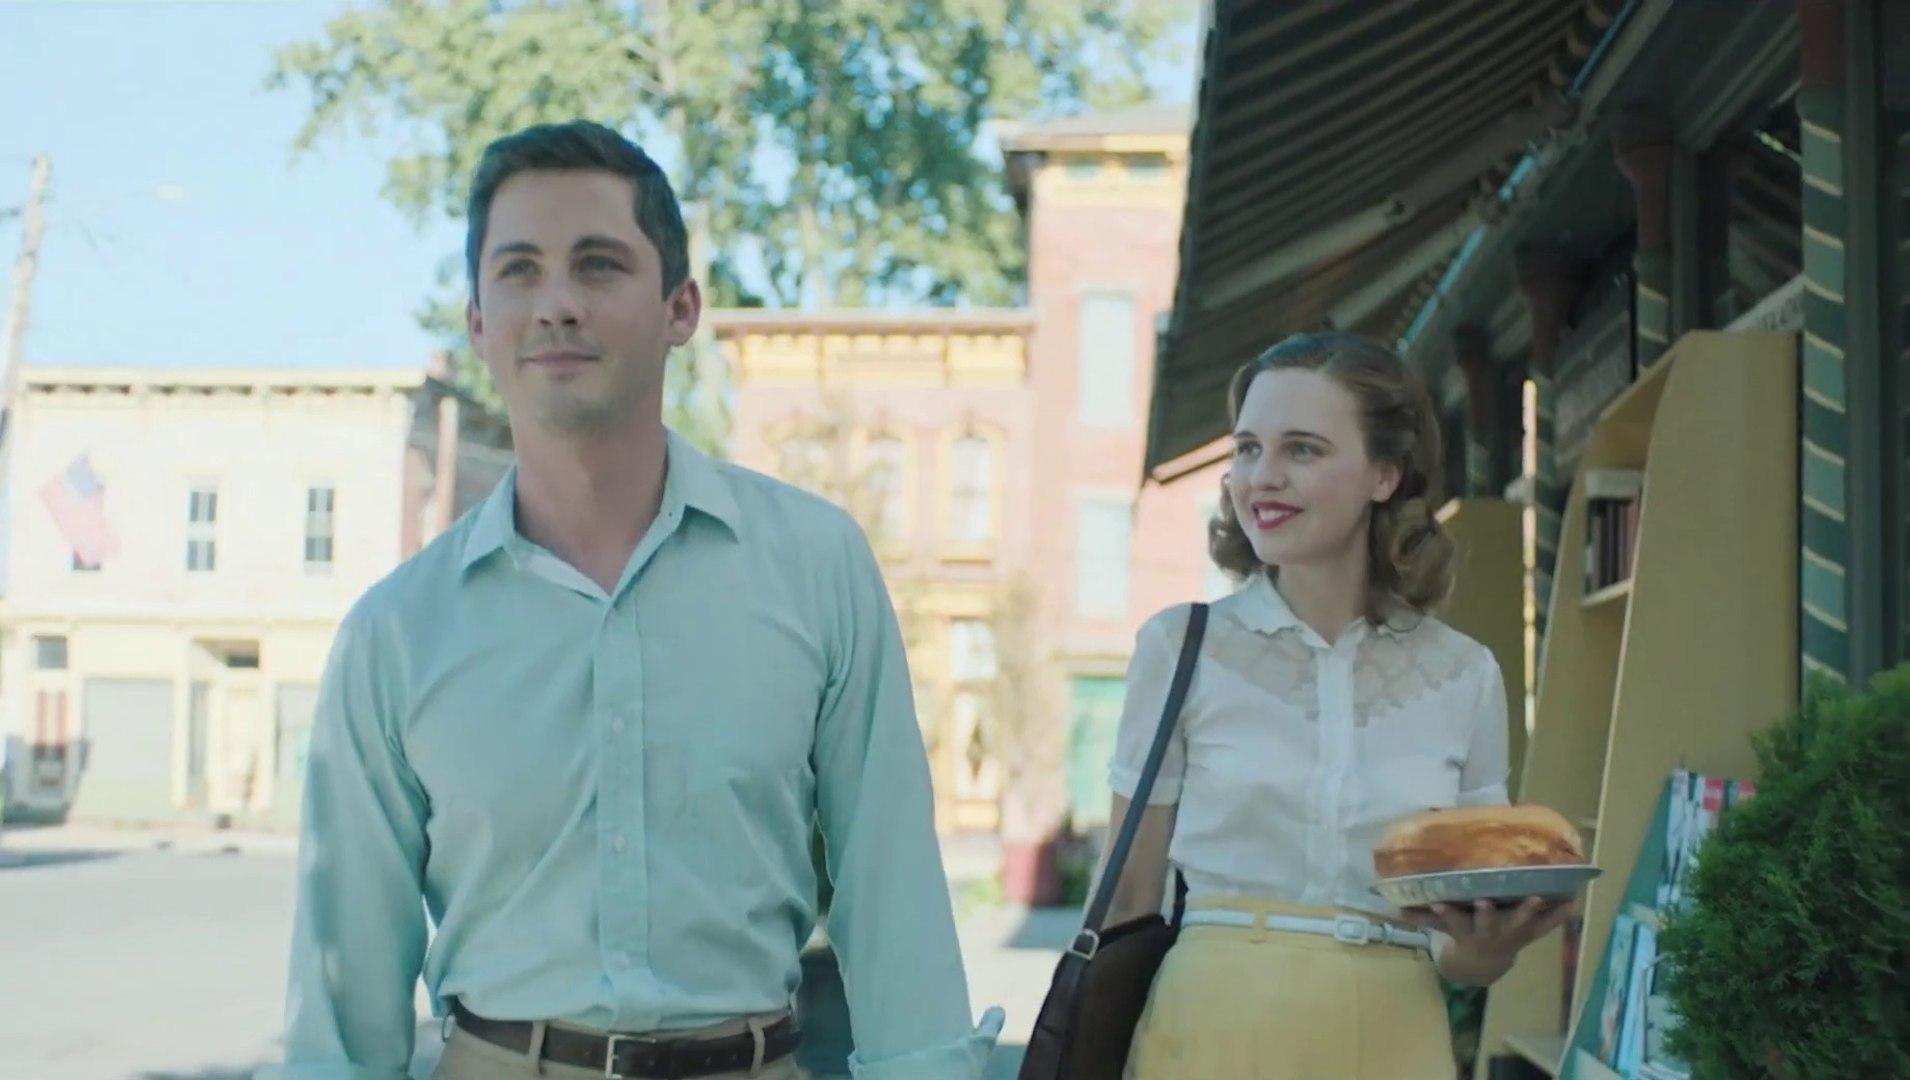 SHIRLEY Film Trailer